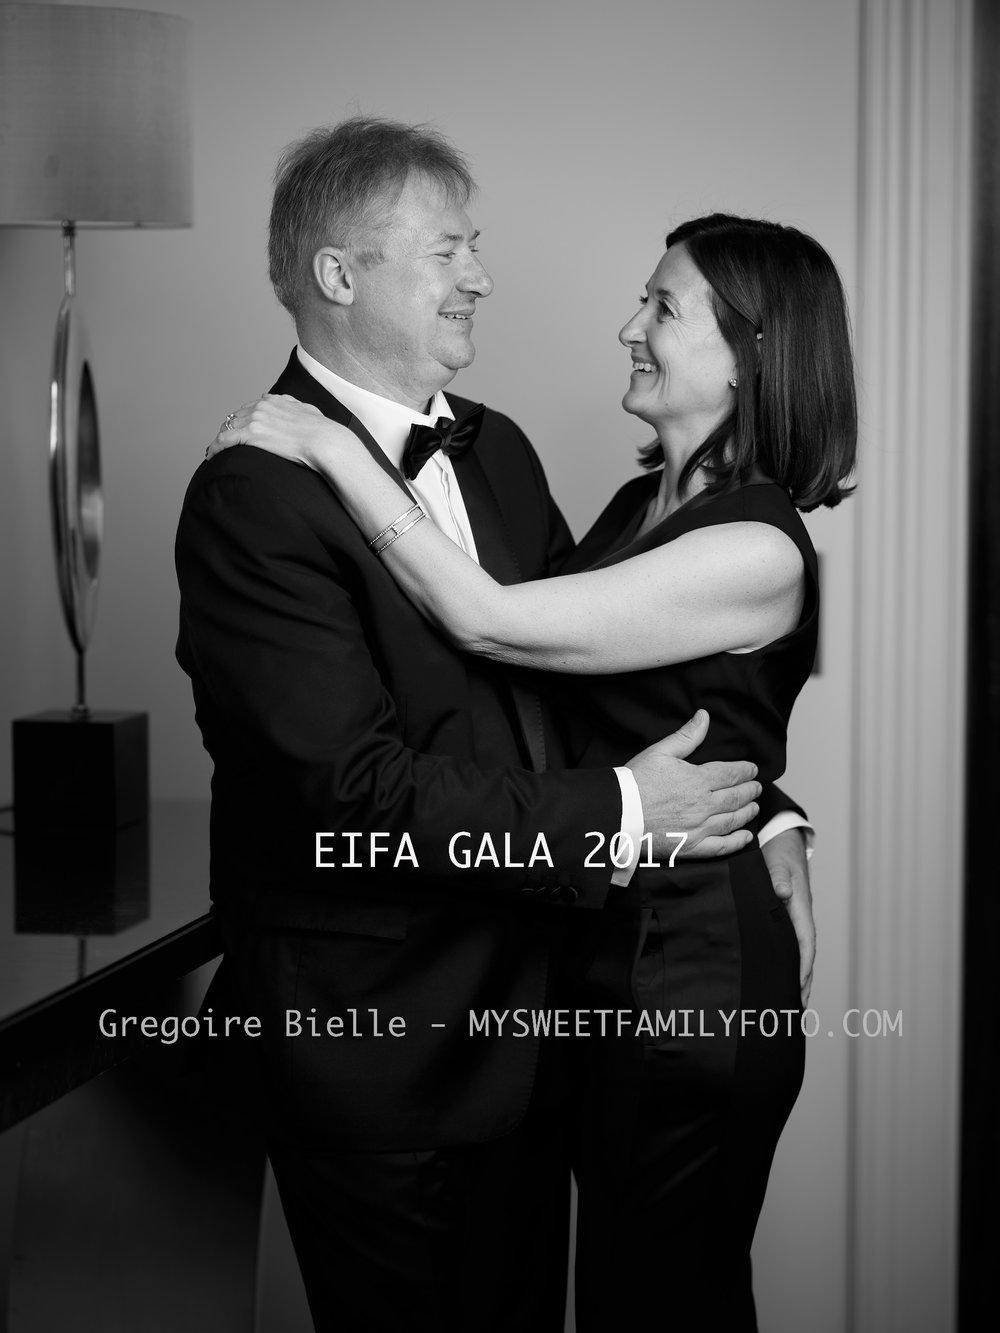 EIFA GALA 1208.jpg